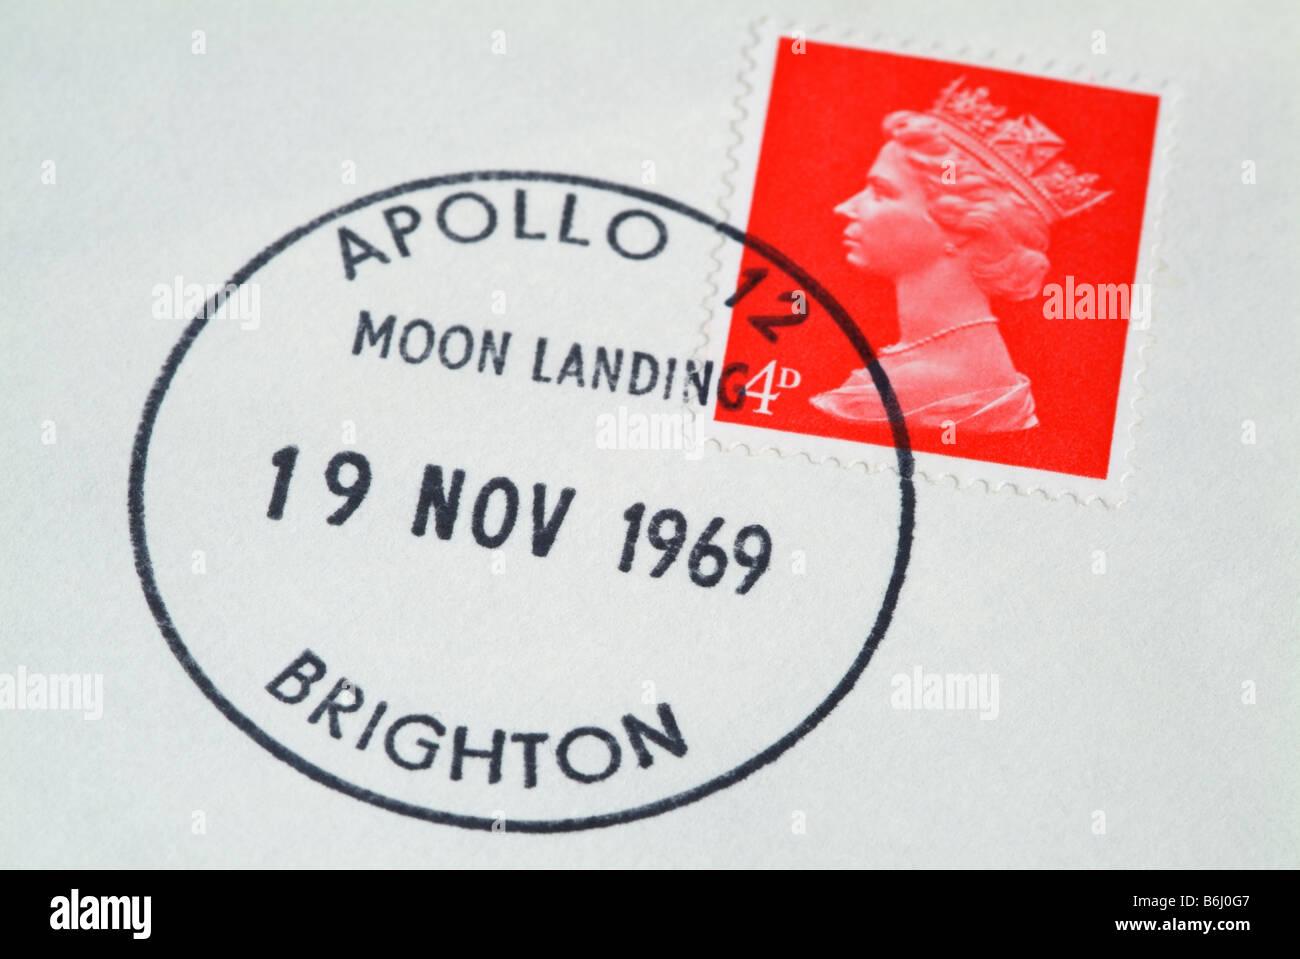 Apollo 12 Moon landing postmark on a UK letter. - Stock Image